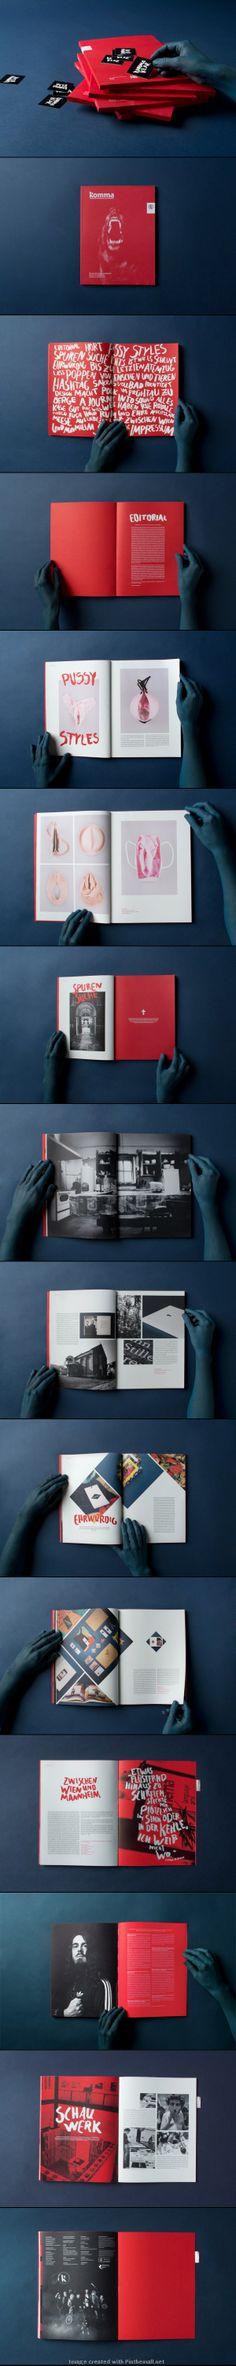 Komma 13 - Design with a little illustration. Very well designed. Layout Design, Design De Configuration, Print Layout, Web Design, Magazine Design, Graphic Design Magazine, Editorial Design, Editorial Layout, Layout Inspiration